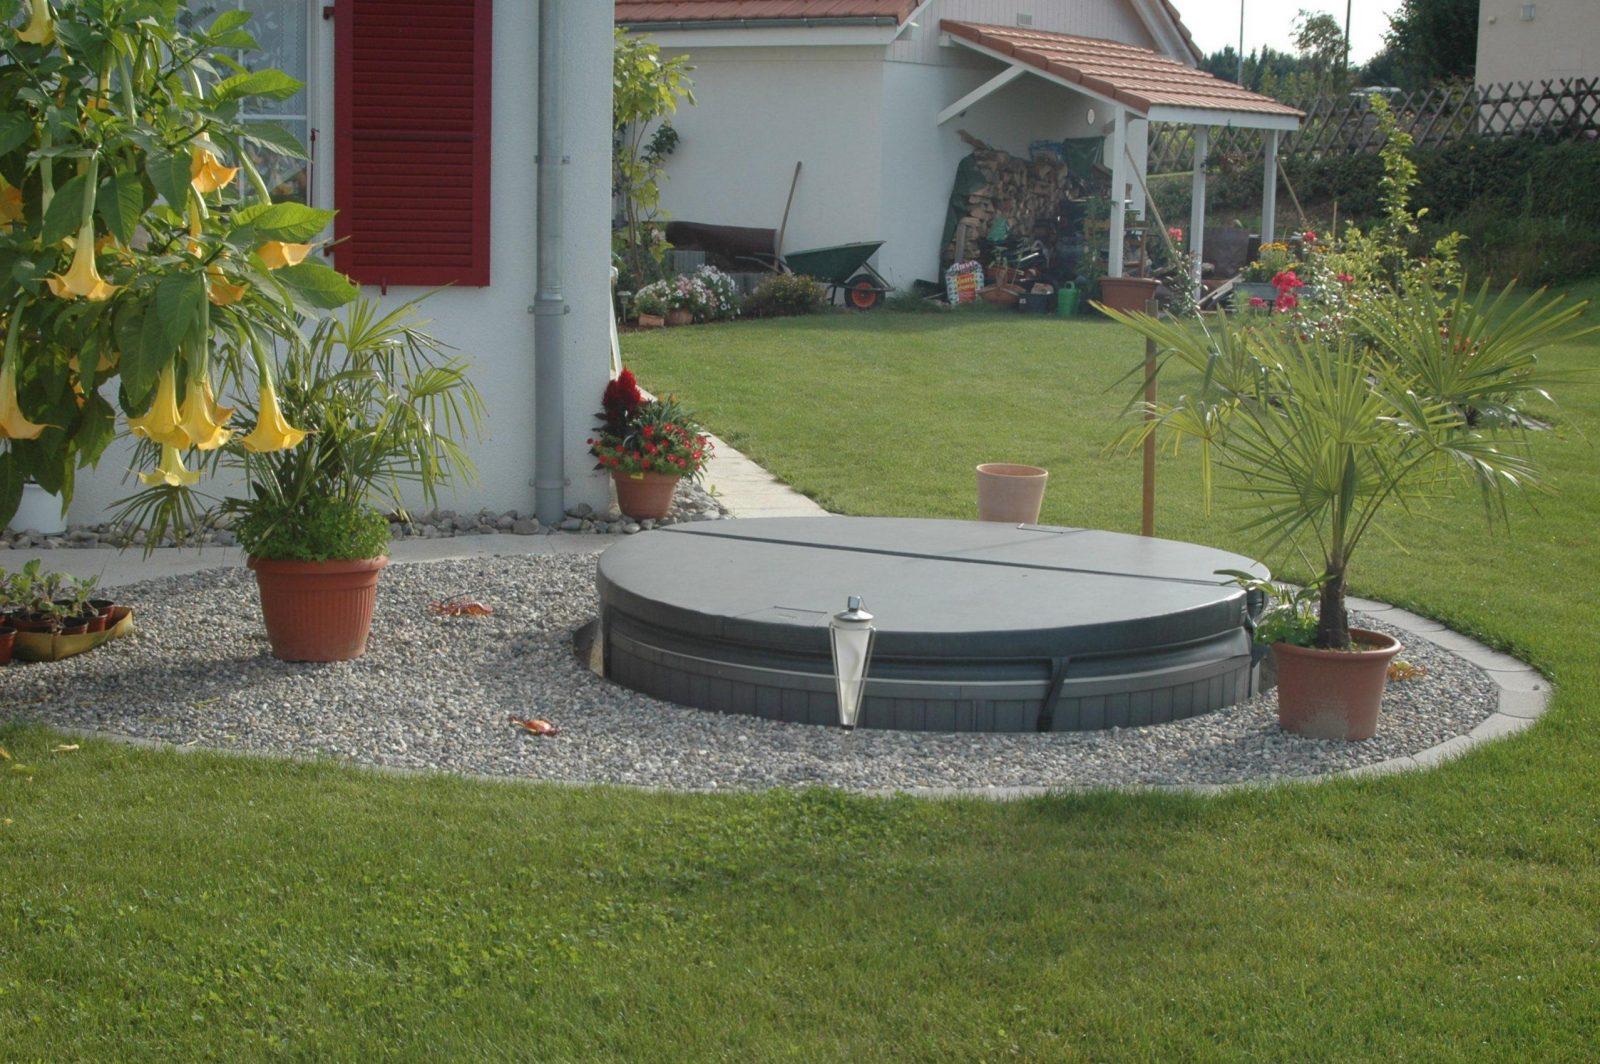 Jacuzzi Aus Holz Selber Bauen – Patrial With Cool Außenwhirlpool von Whirlpool Selber Bauen Holz Bild